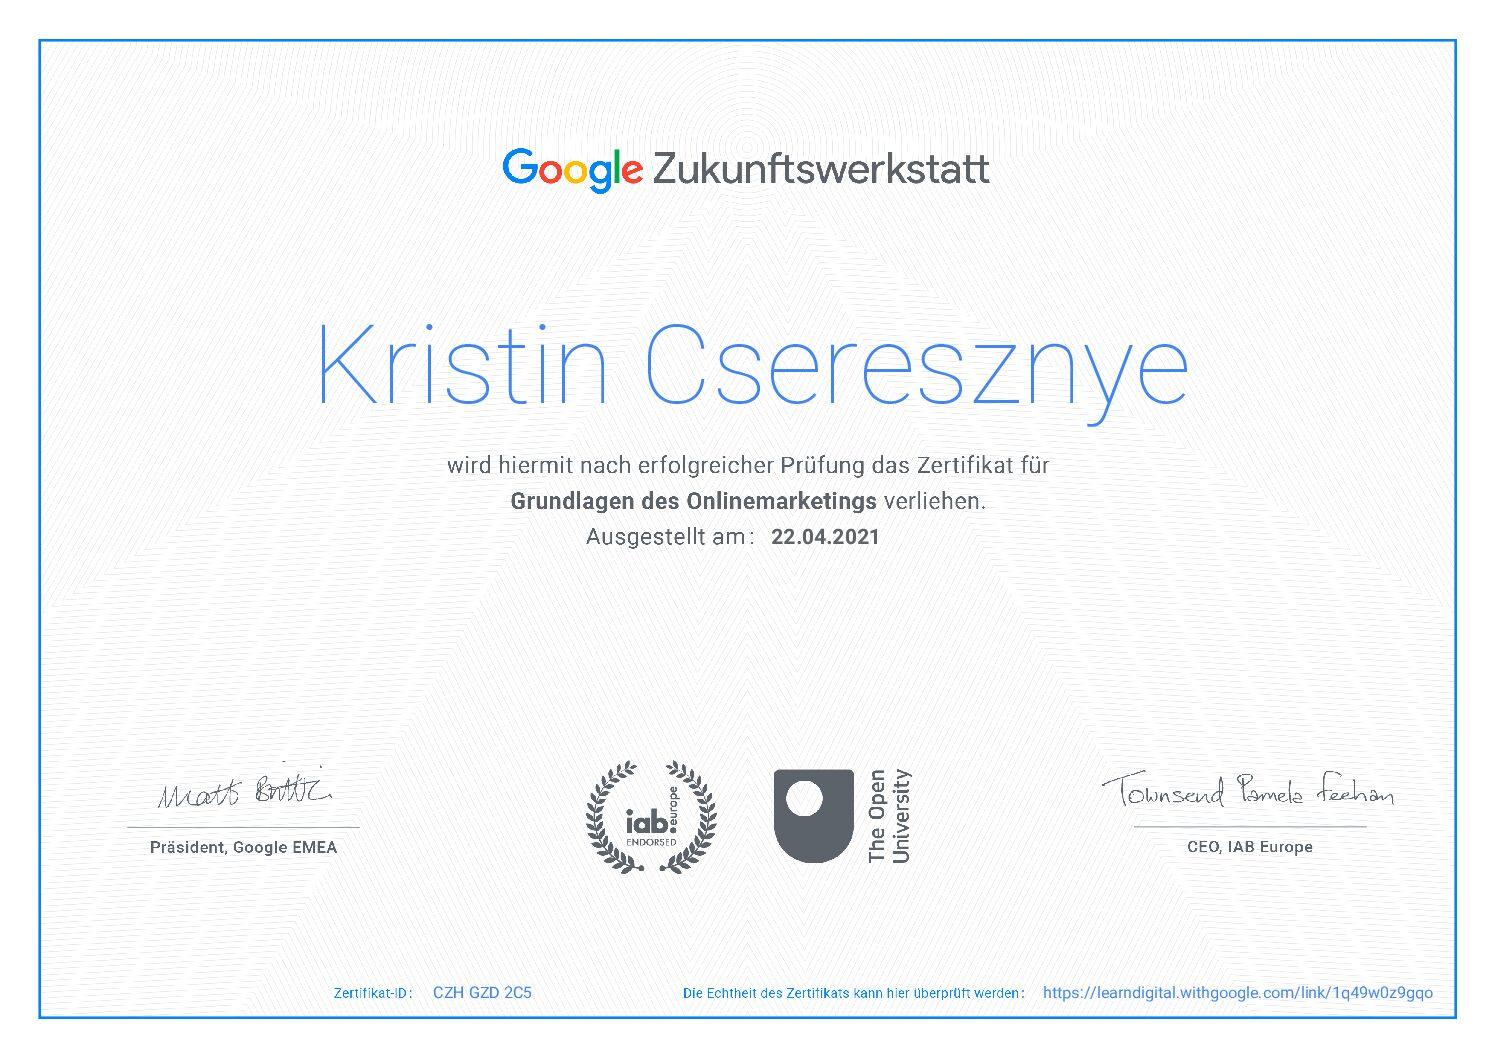 Kristin Cseresznye Blog, SocialMedia Managerin, Virtuelle Assistentin